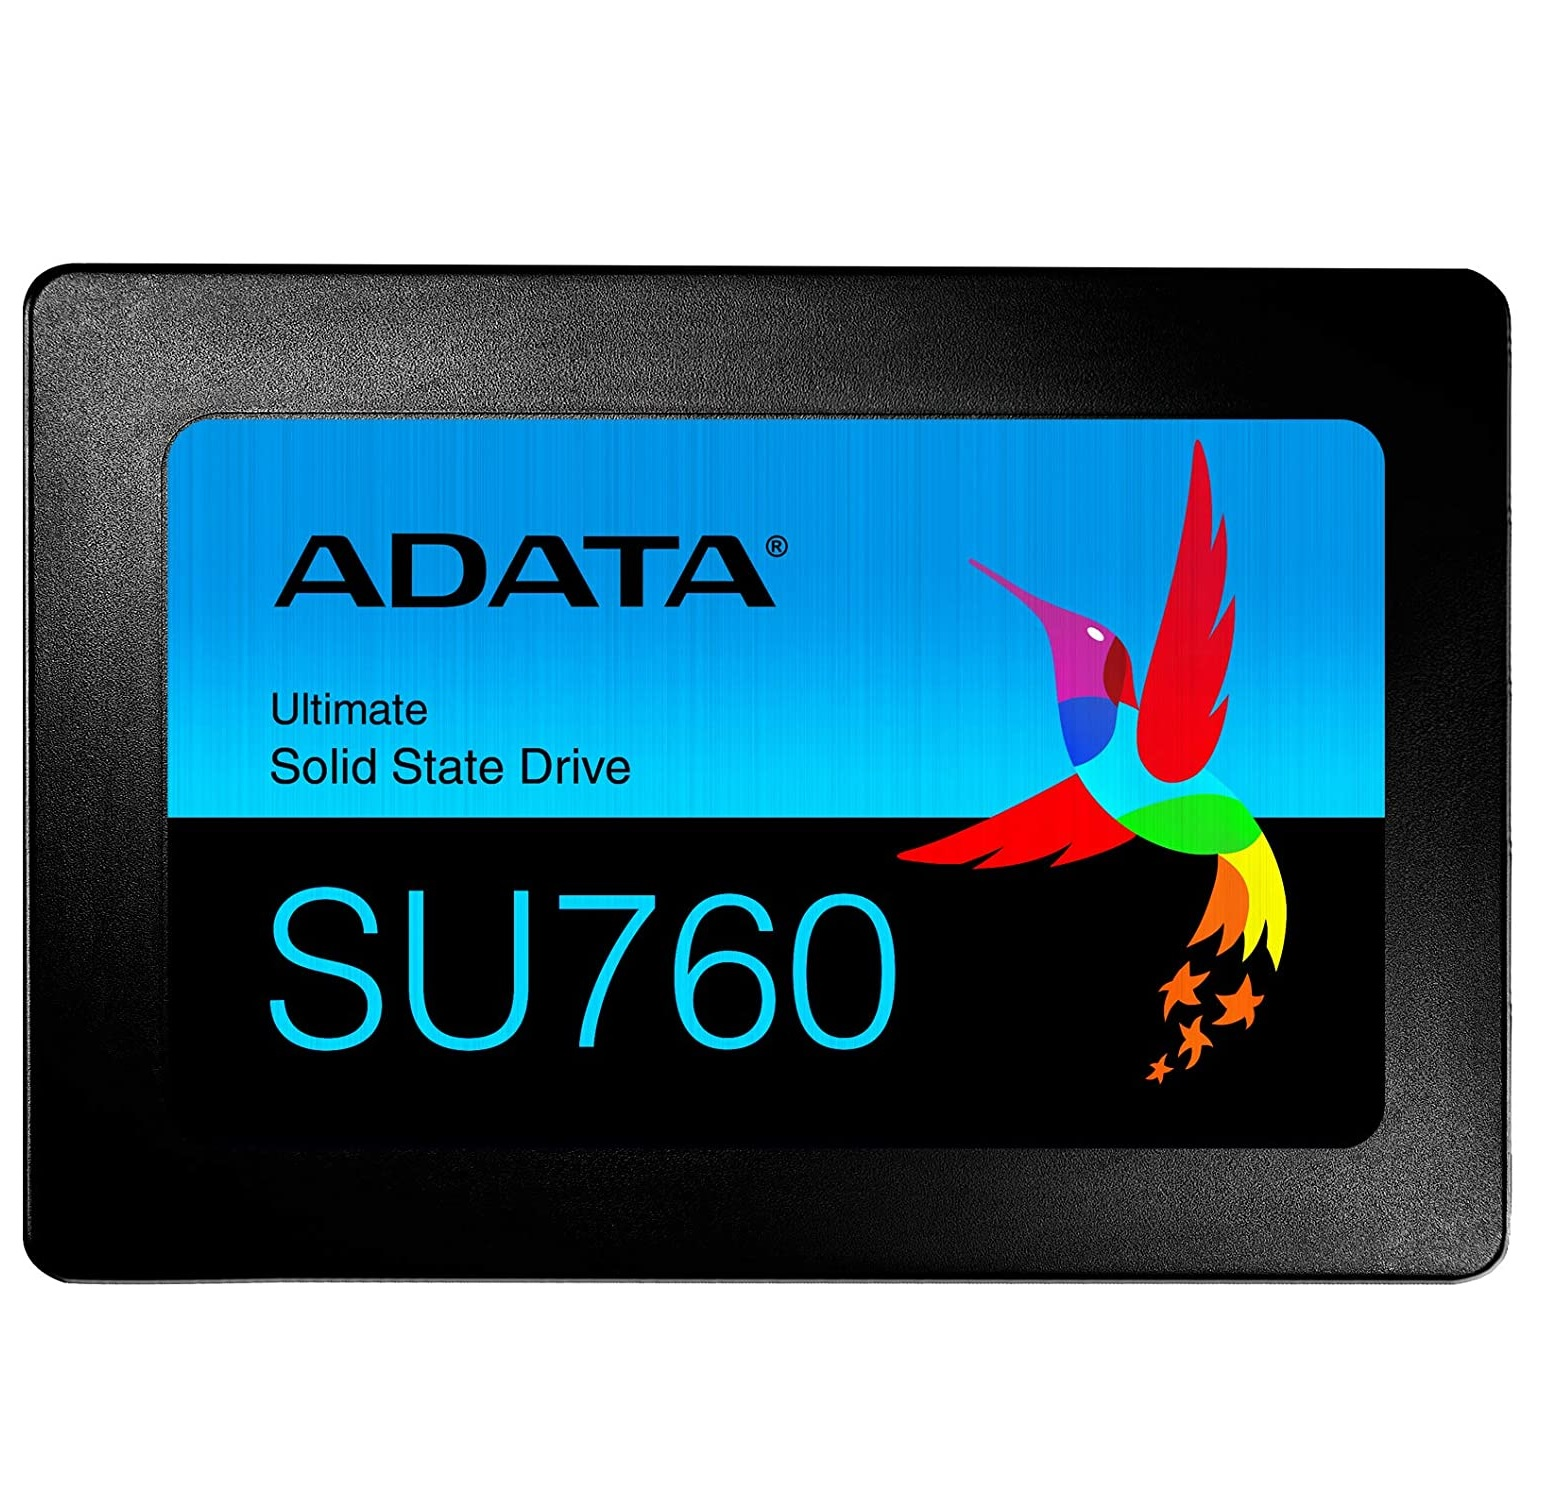 Adata Ultimate SU760 Solid State Drive